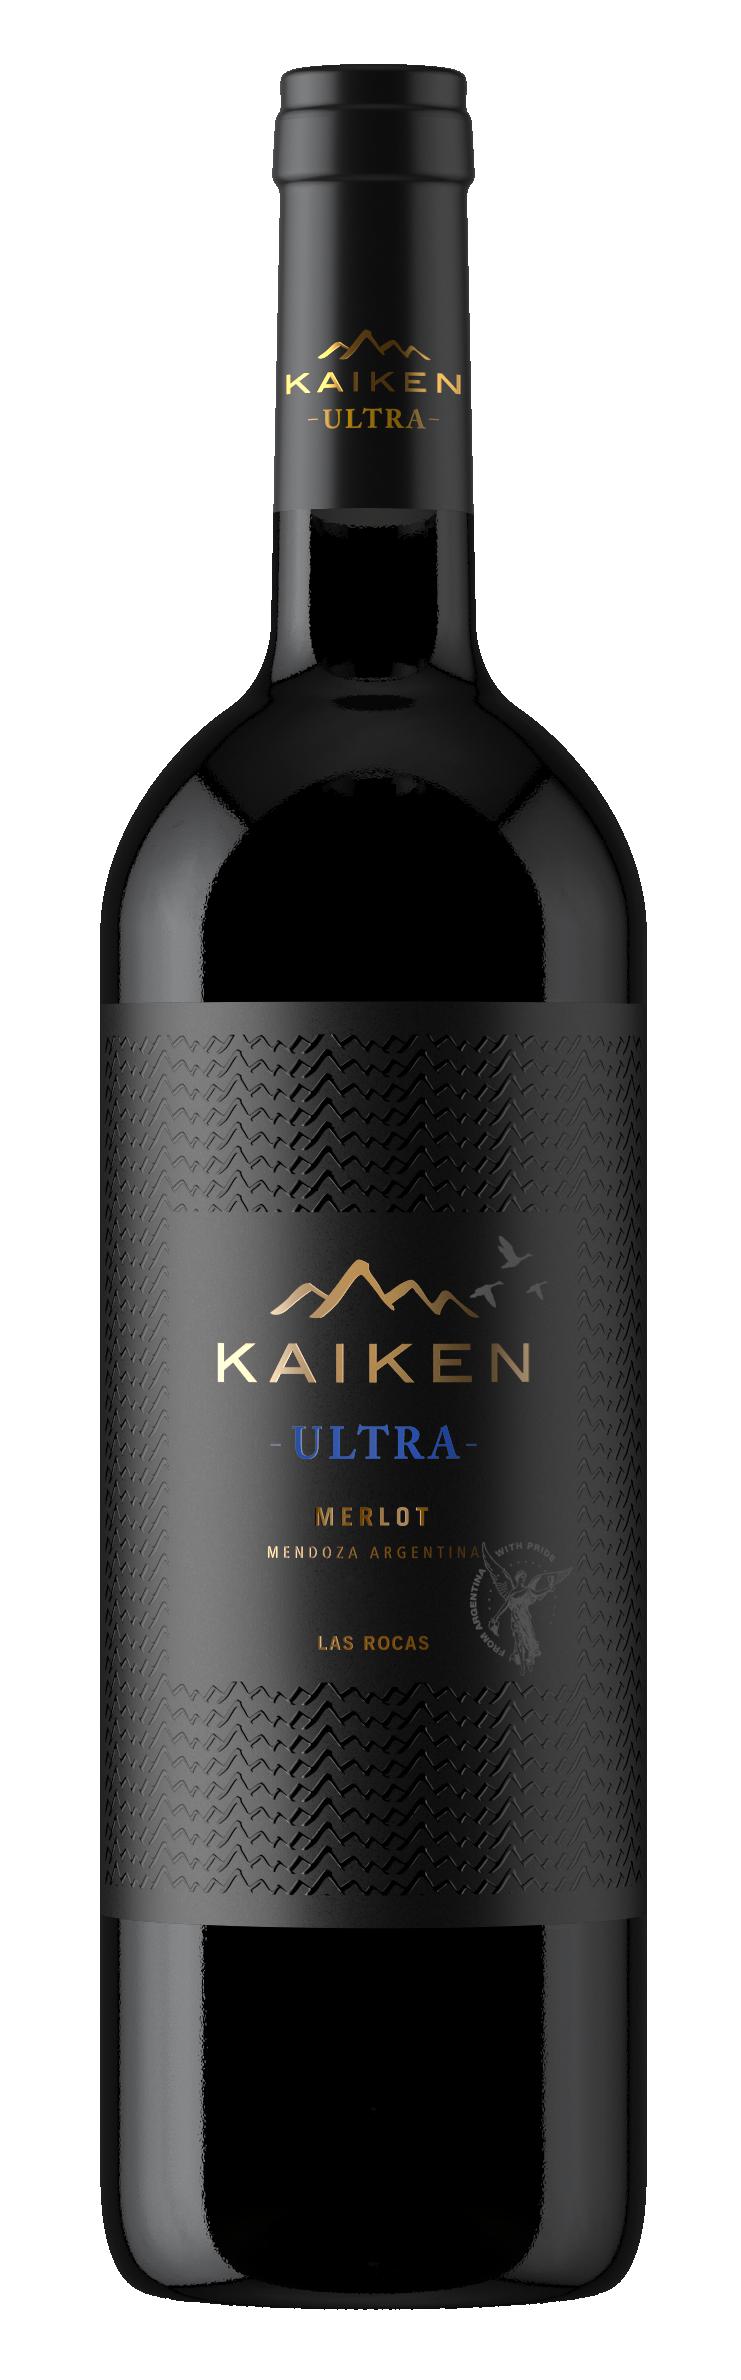 Kaiken Ultra, Mendoza Merlot 2016